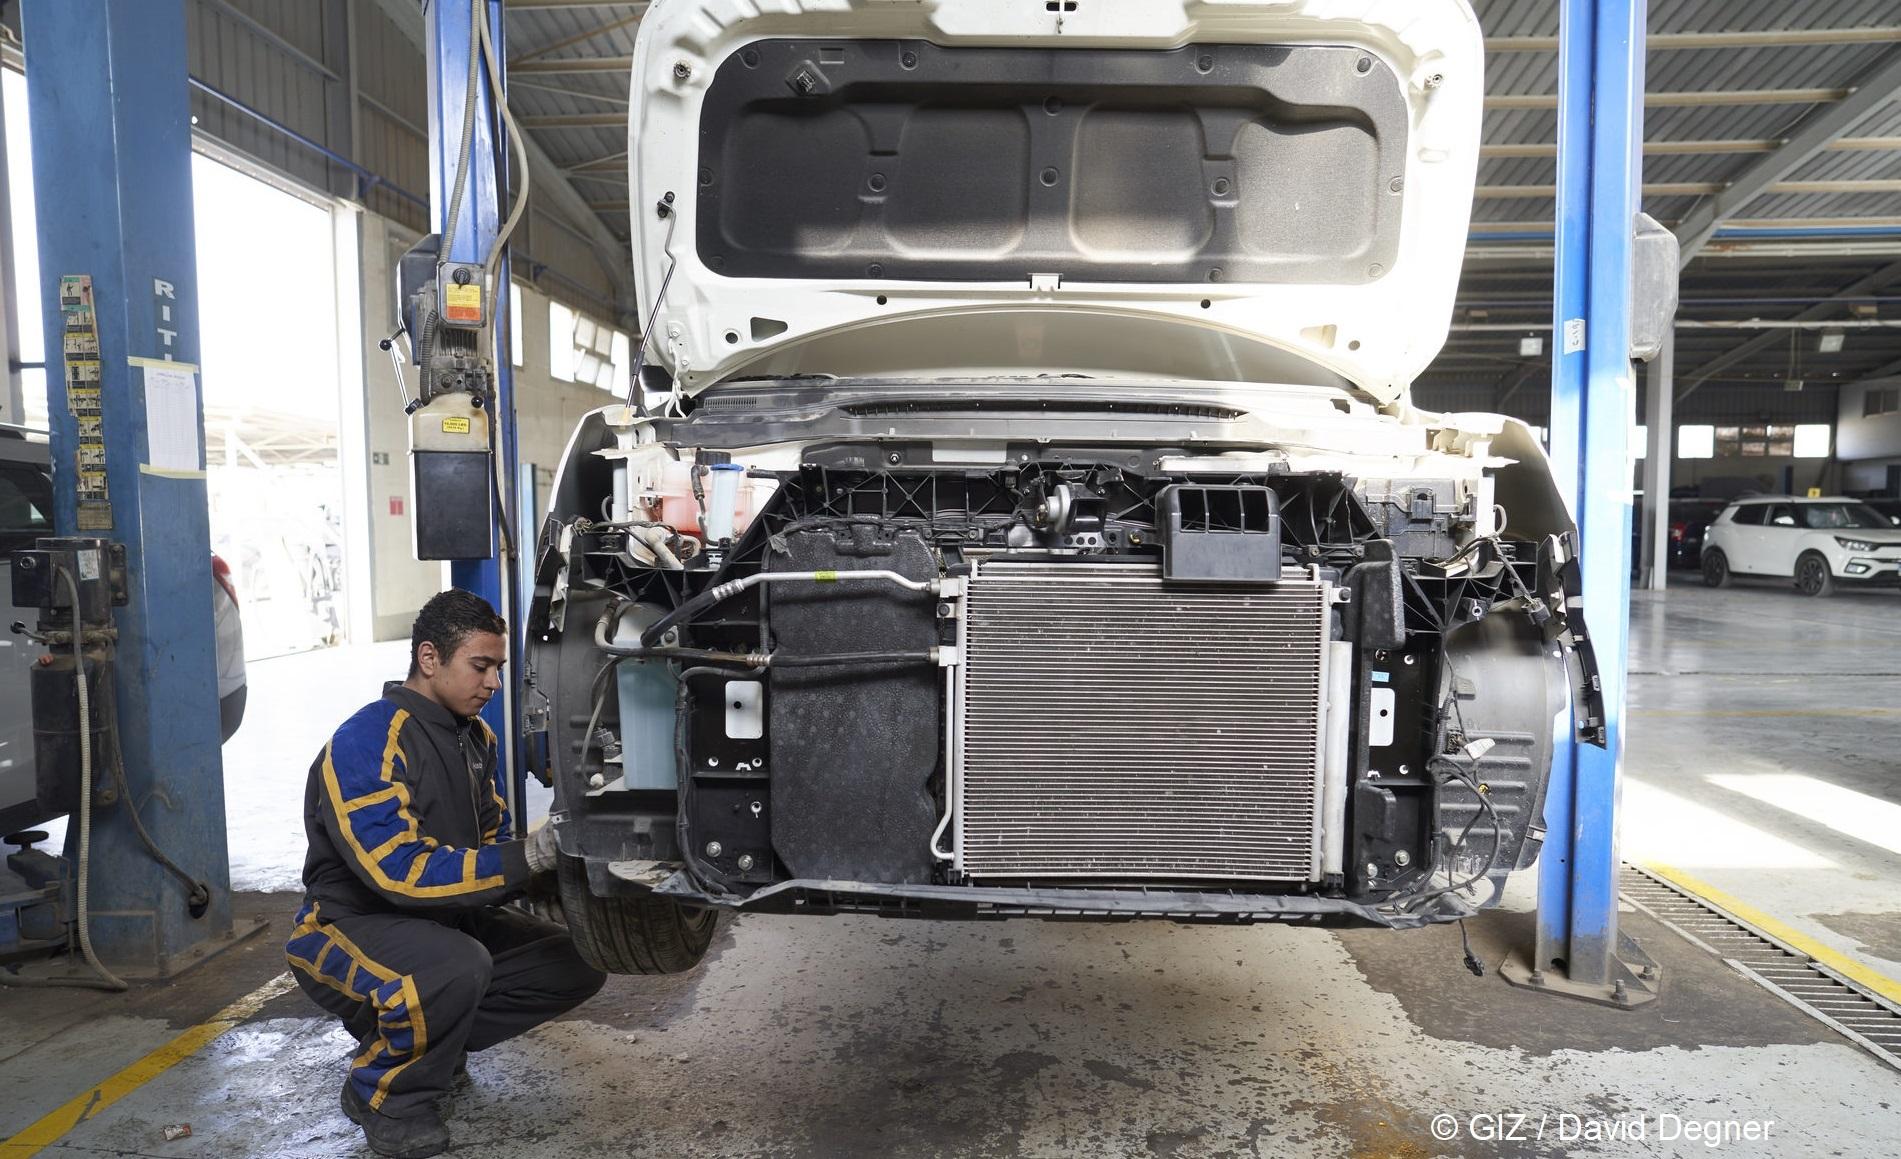 Mechaniker arbeitet an Auto